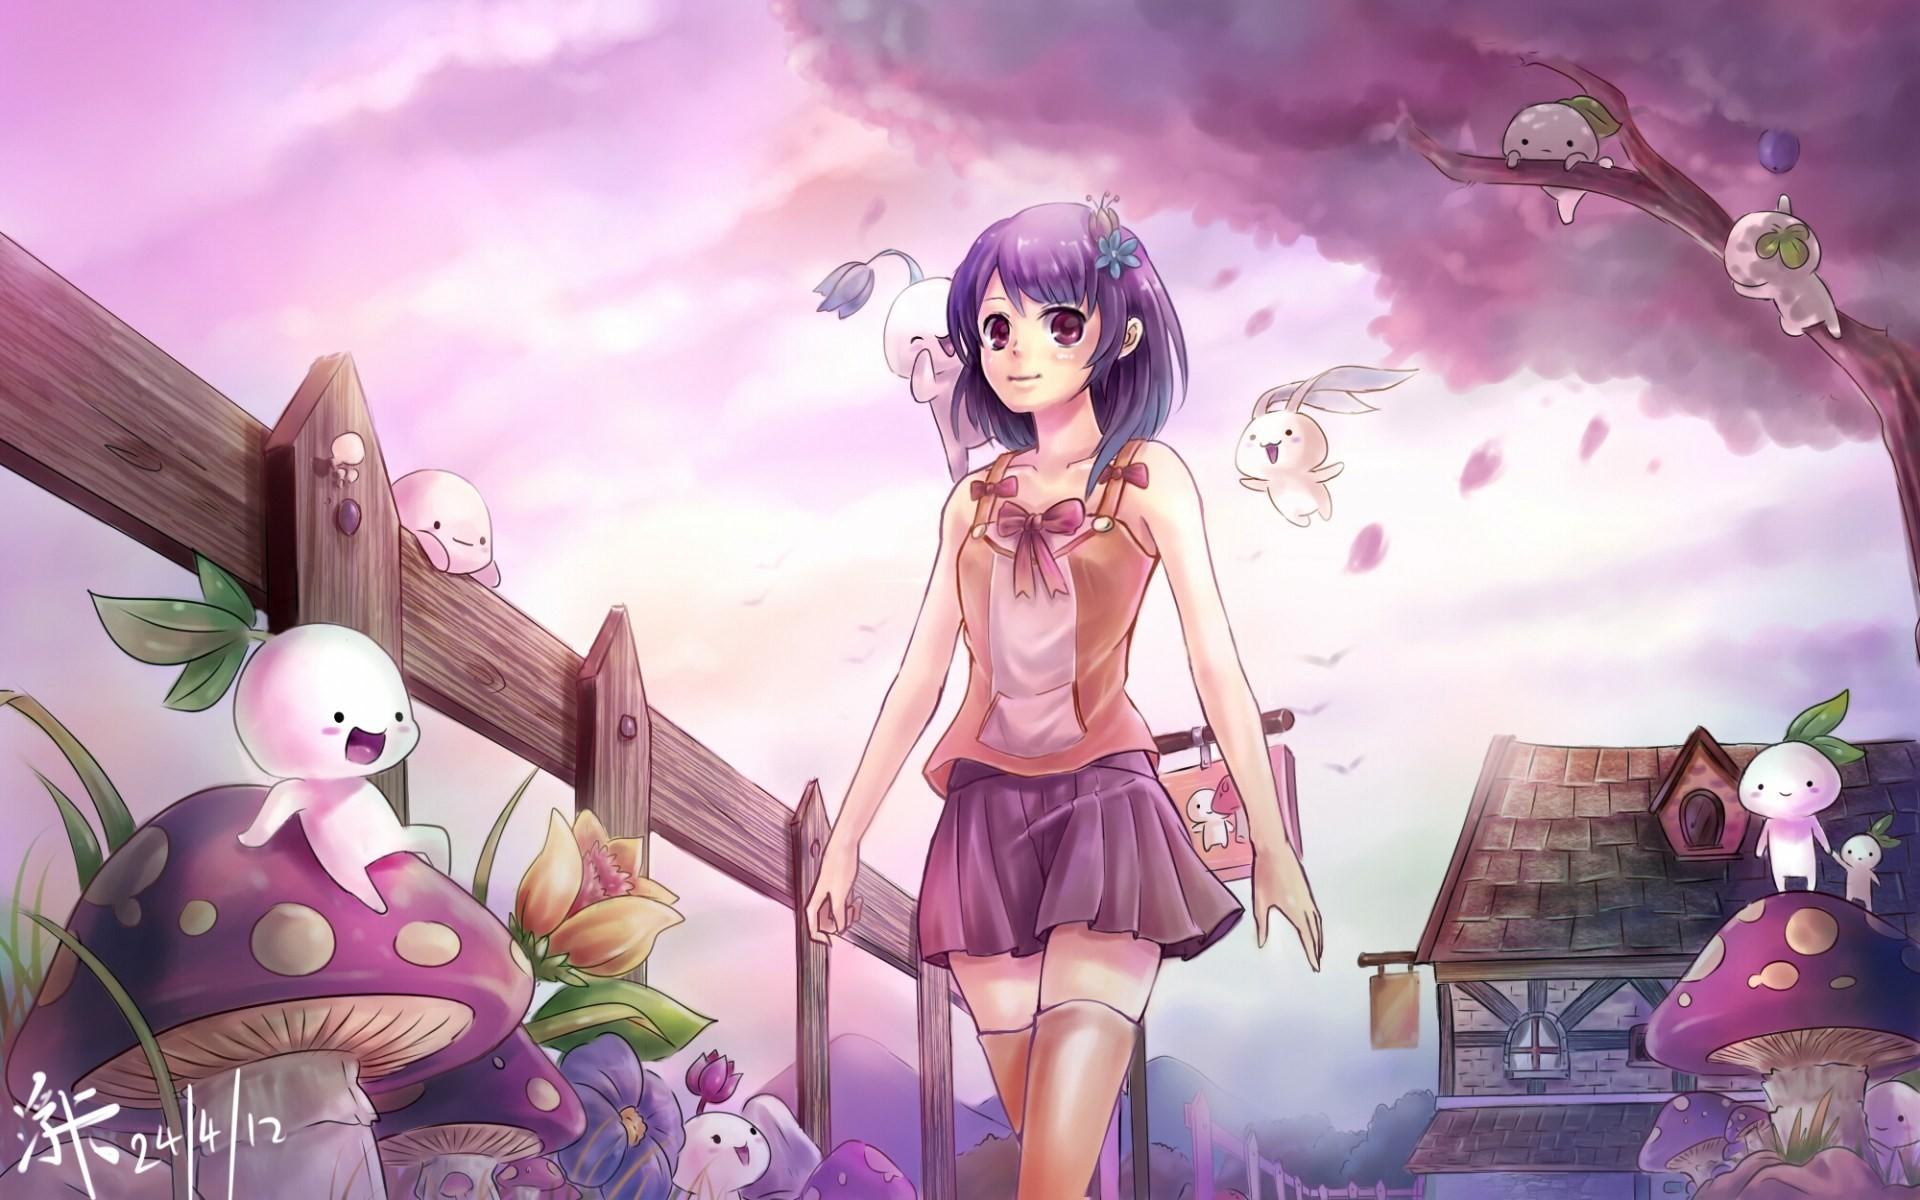 … Cute Anime Wallpaper Hd